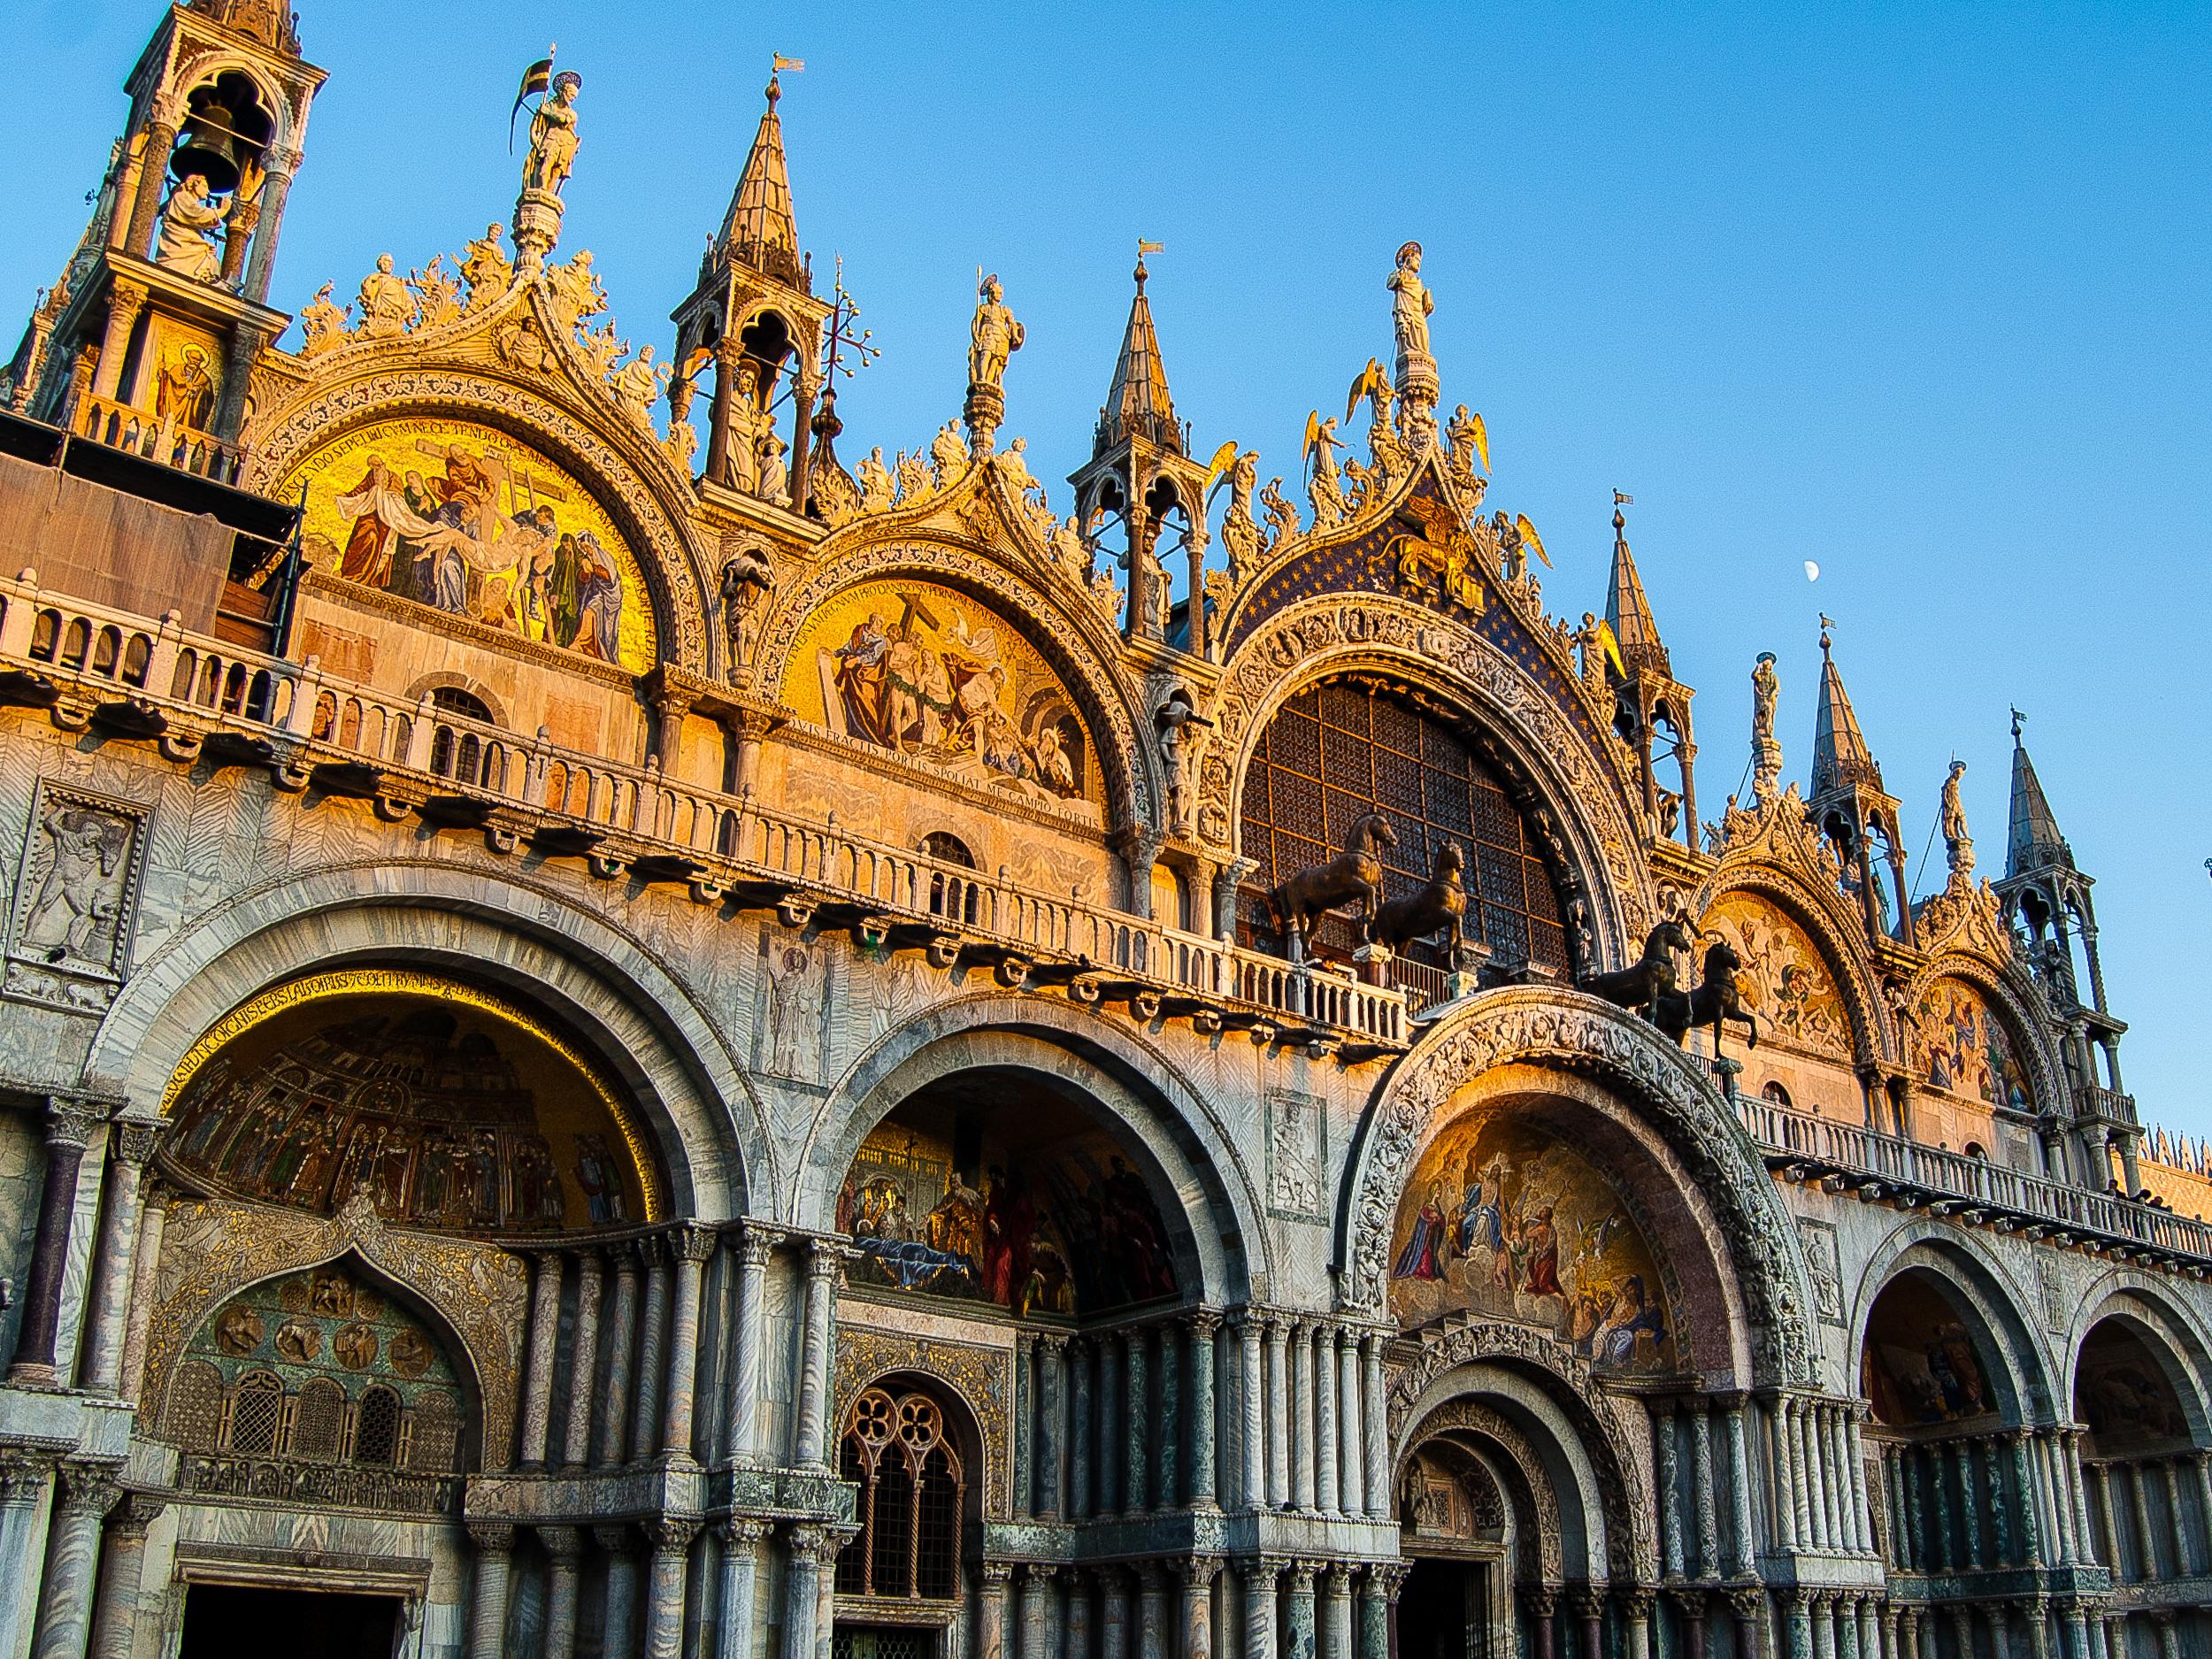 Venice Italy Saint Mark's Basilica Basilica di San Marco